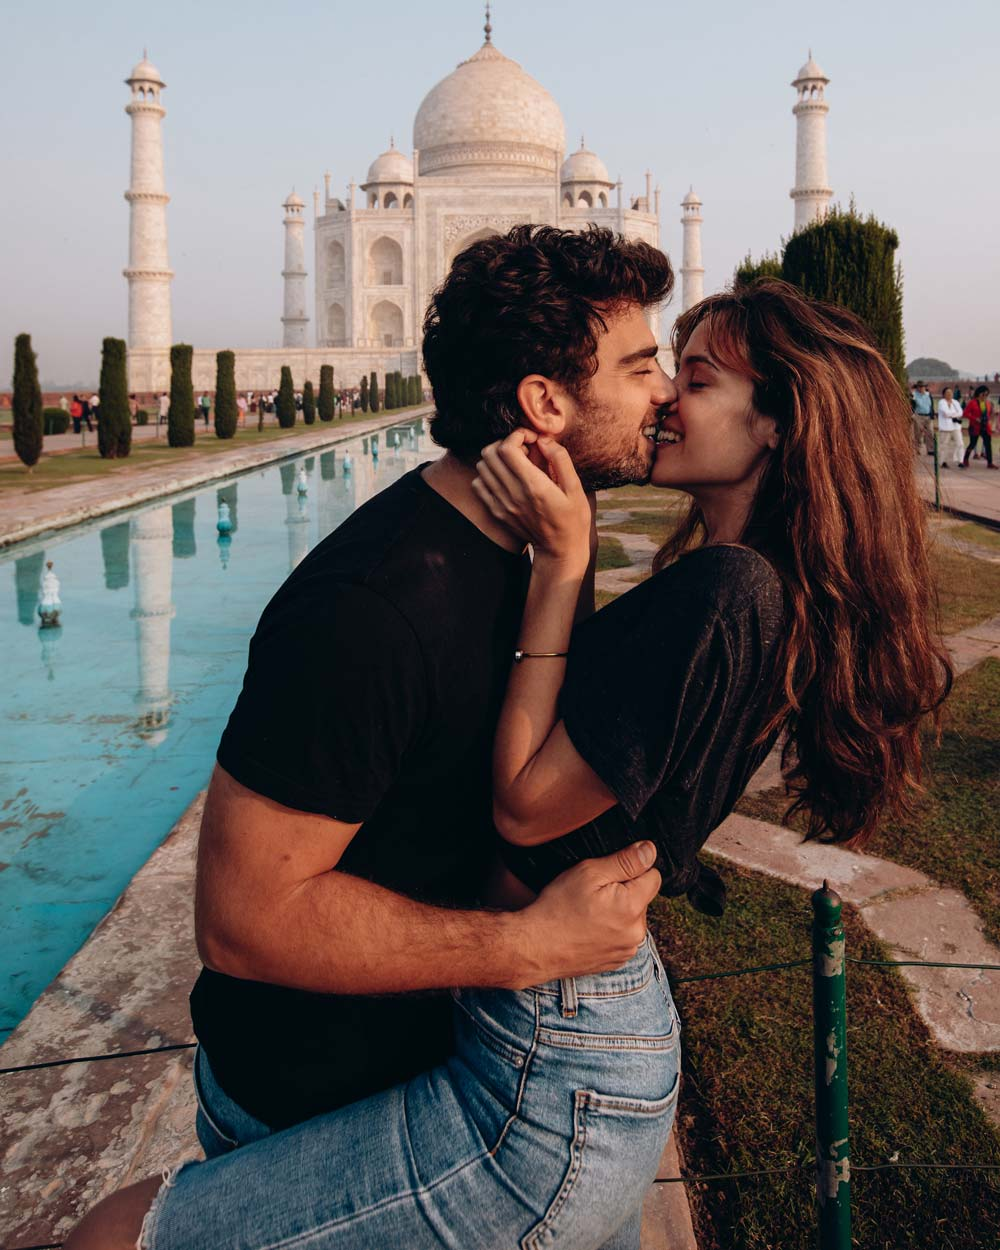 india-taj-mahal-romantic-cute-couple-poses-photos